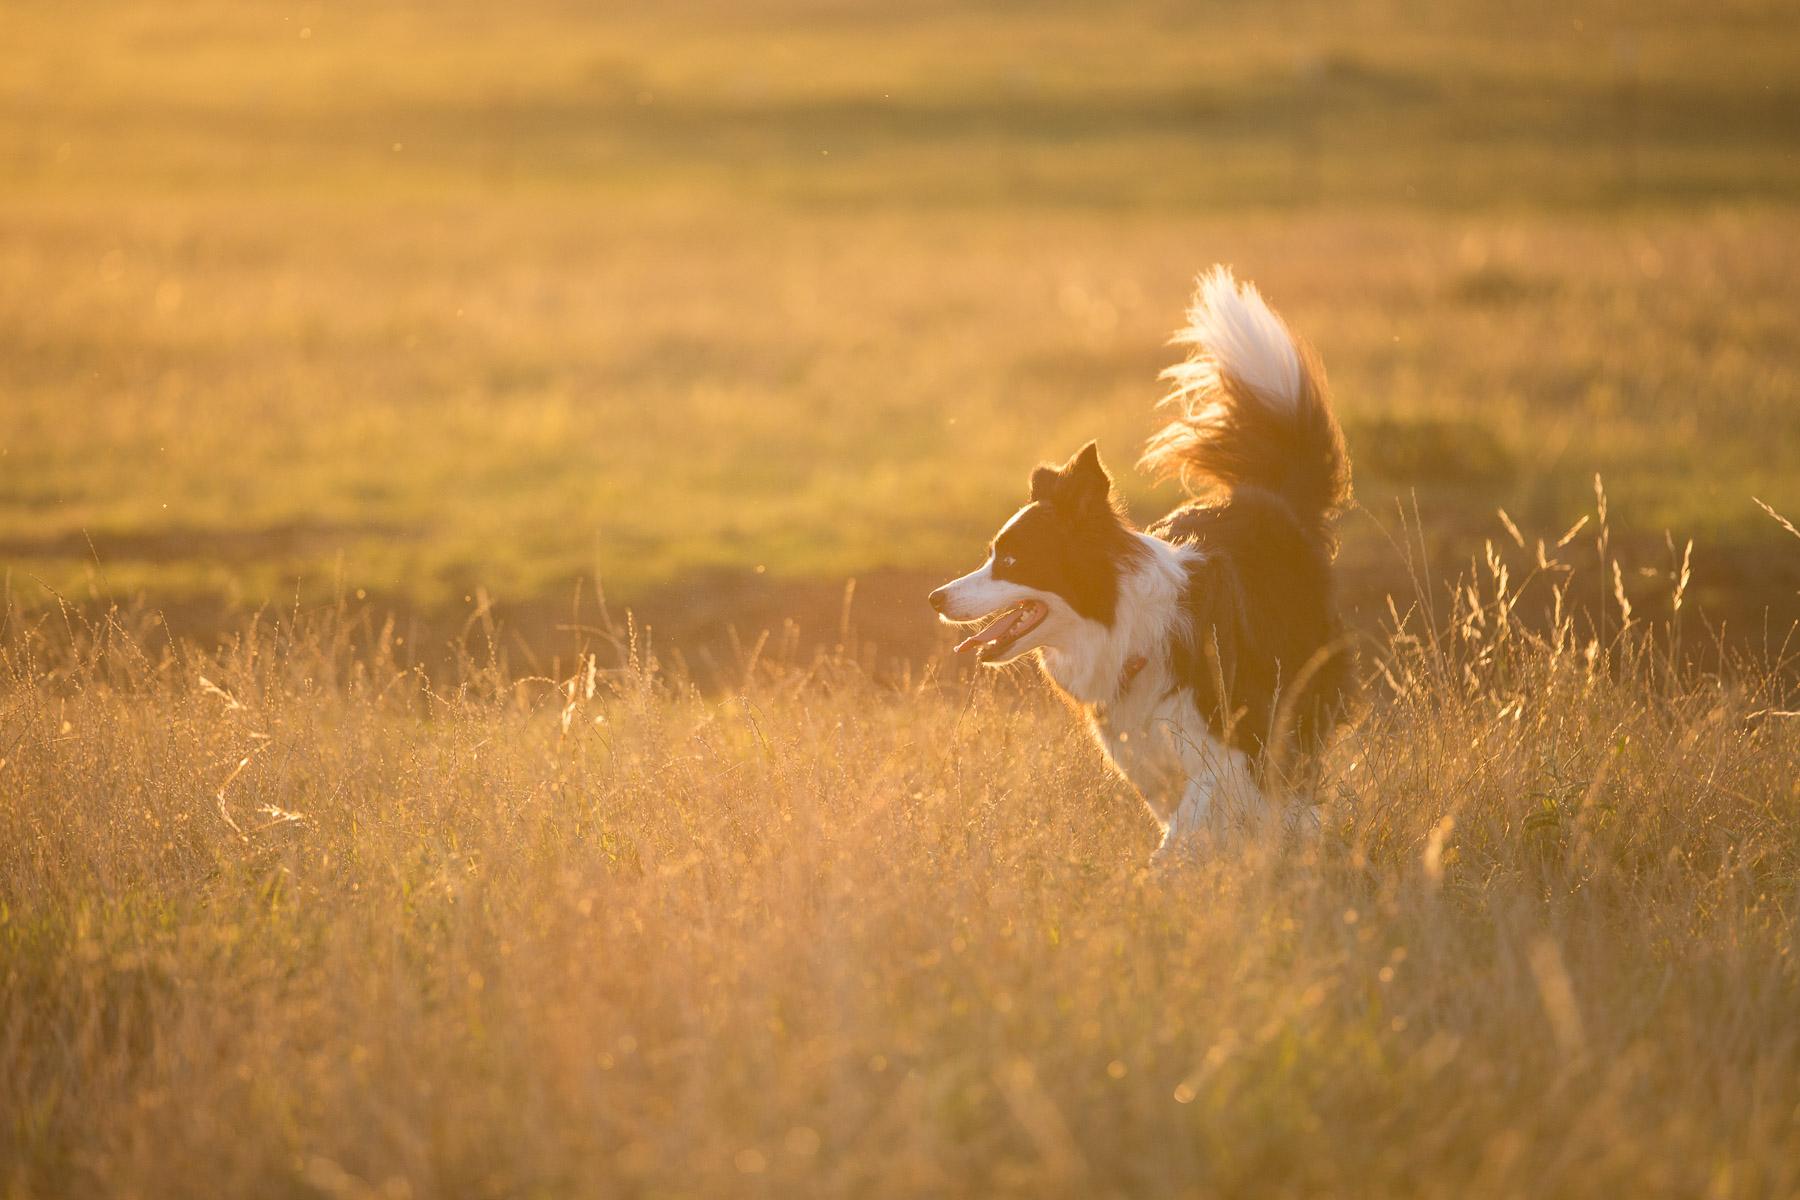 dog-border-collie-running-field-sunset-dog-photography.jpg